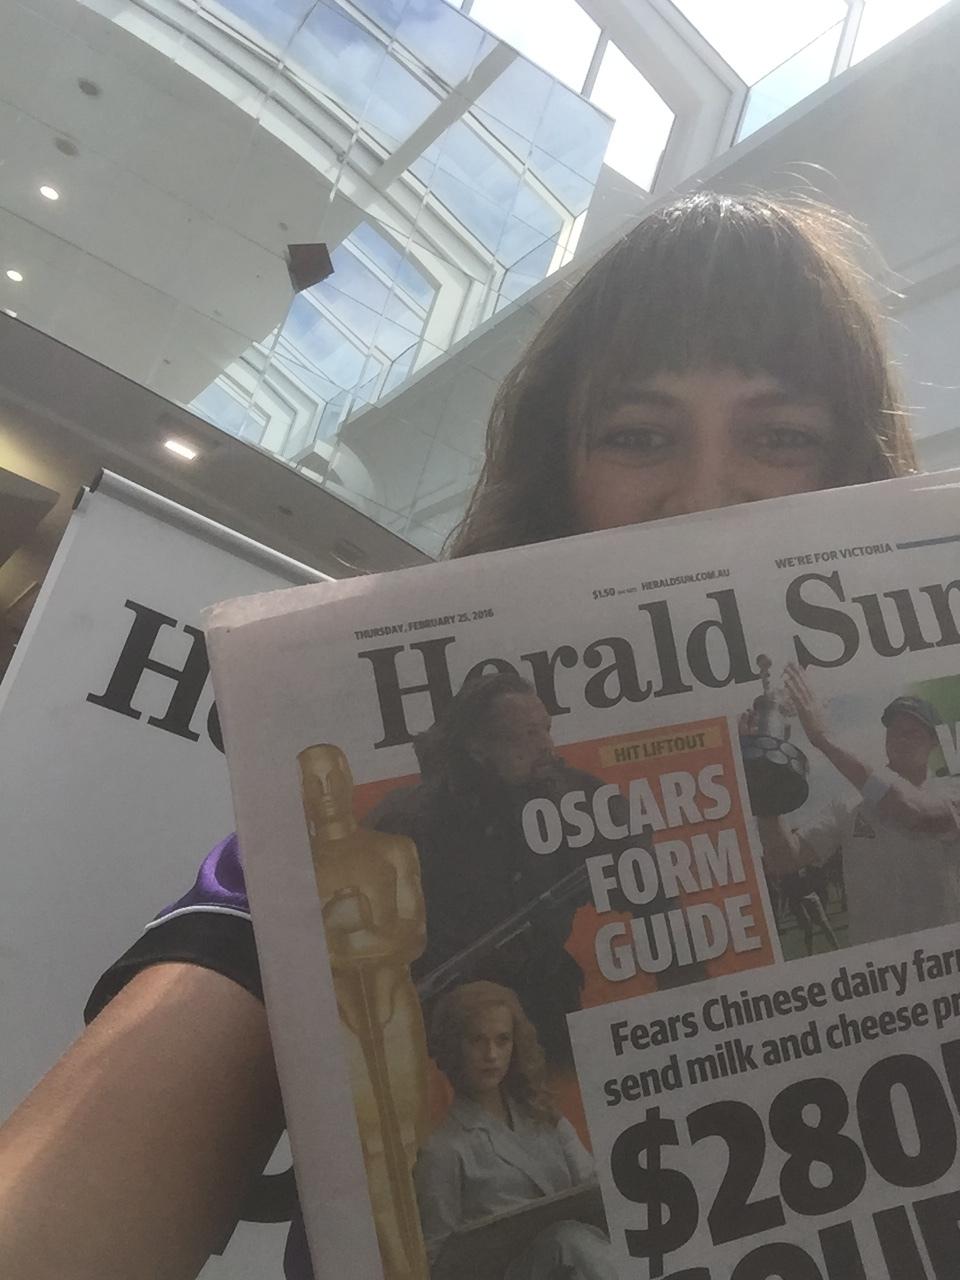 Up the Herald Sun!